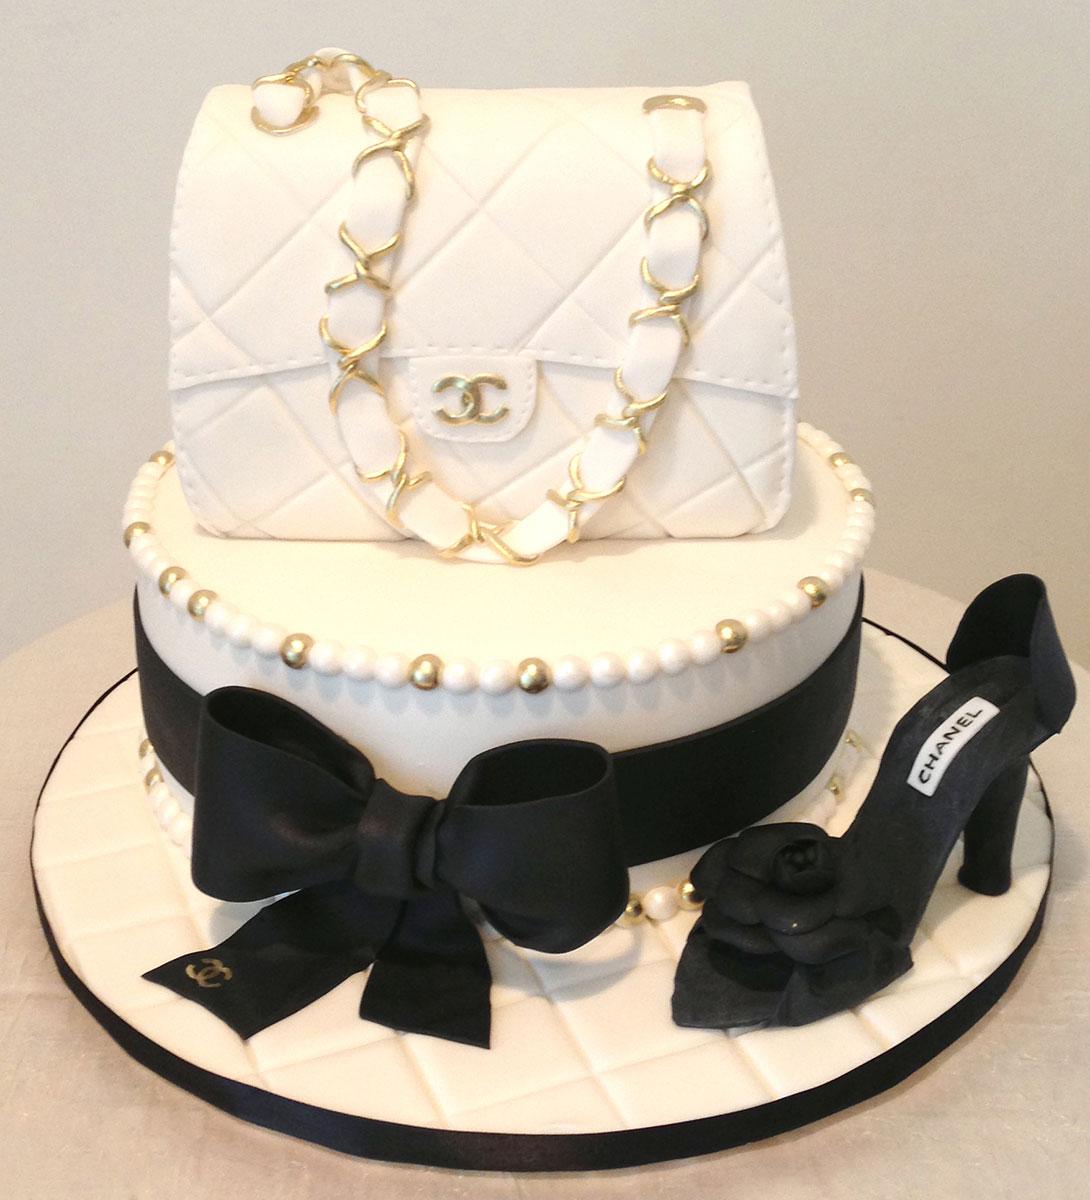 Chanel Cake Designs: Custom Cake Studio